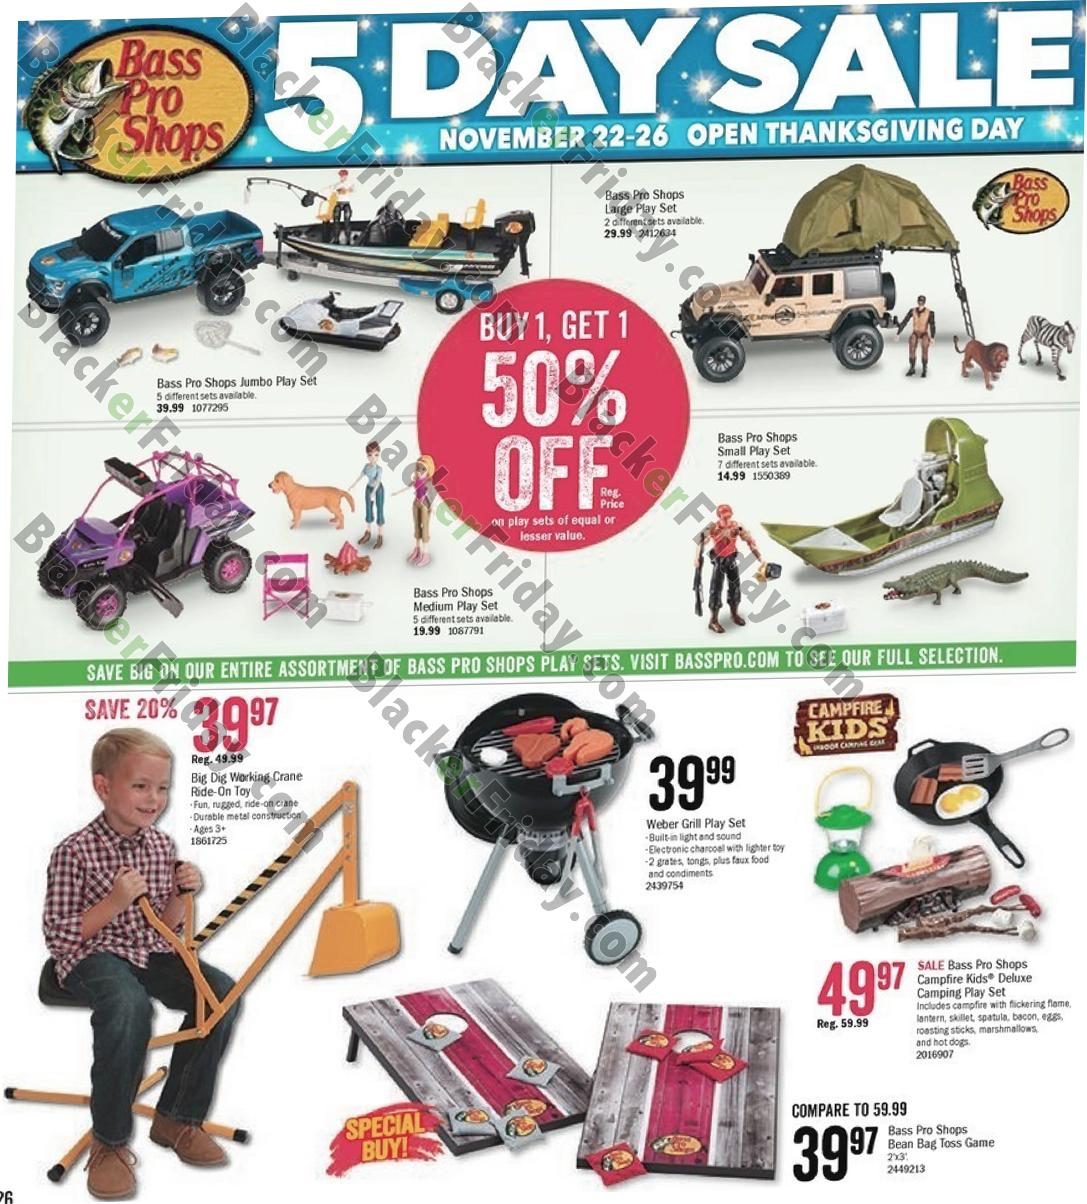 Bass Pro Shops Black Friday 2019 Ad & Sale - BlackerFriday com